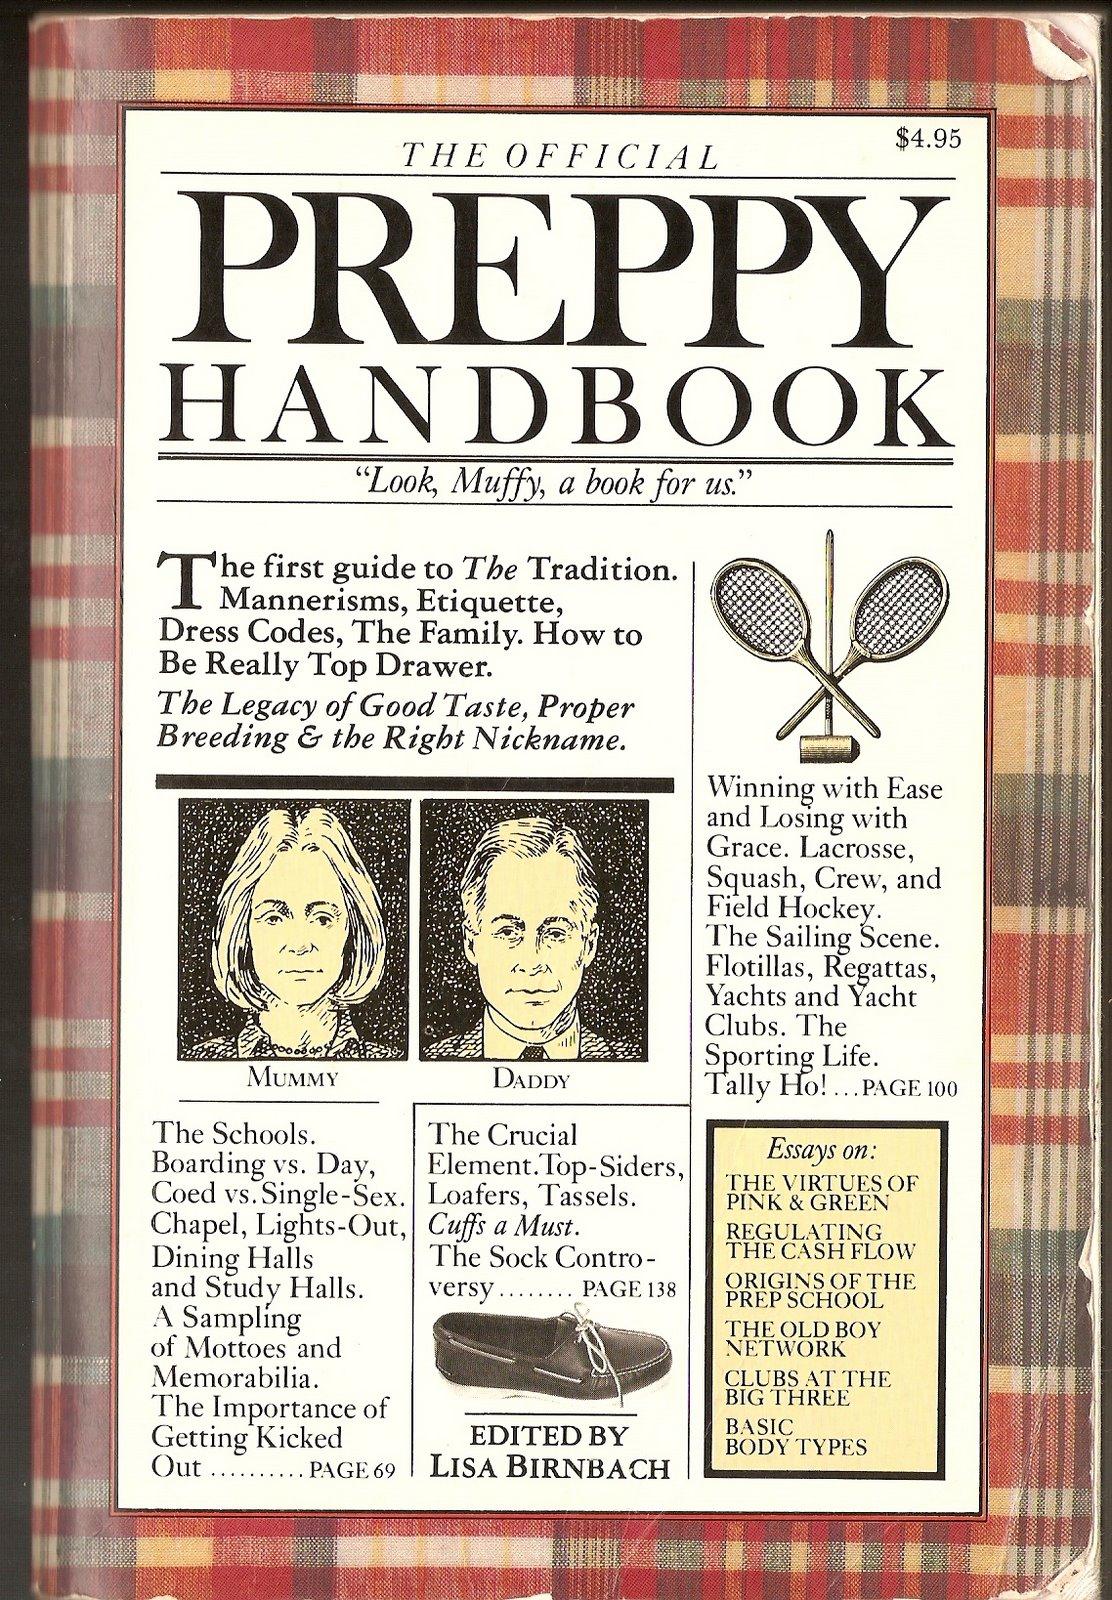 http://4.bp.blogspot.com/-uQuzOoegB24/TgeXKELhEKI/AAAAAAAAAFI/6mD8A-BiFJ4/s1600/official+preppy+handbook.jpg